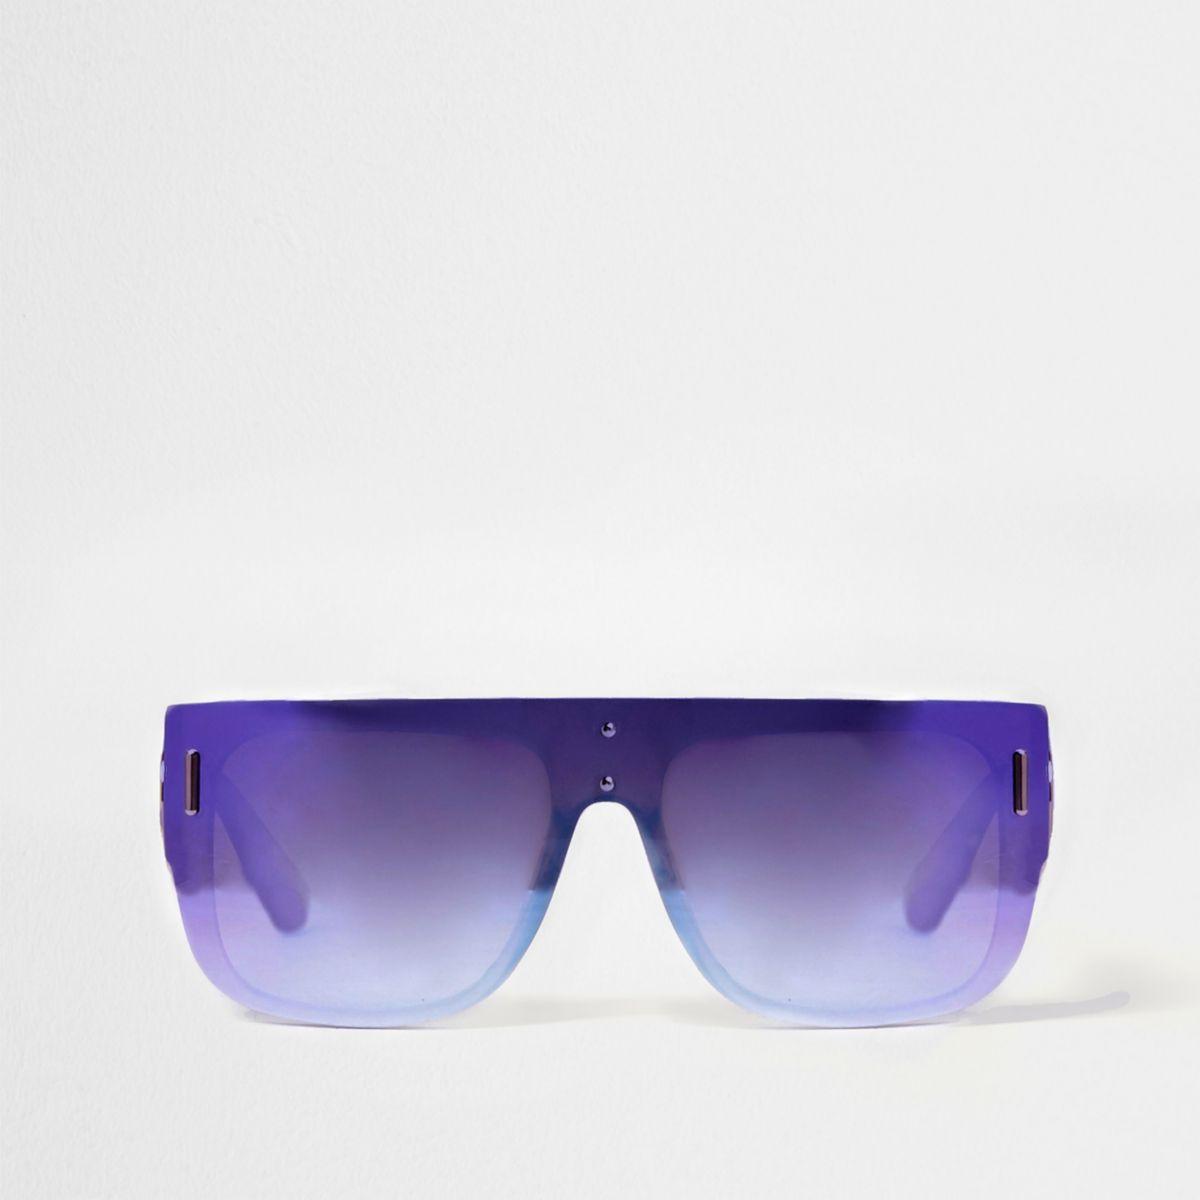 Purple mirrored lens flat top sunglasses